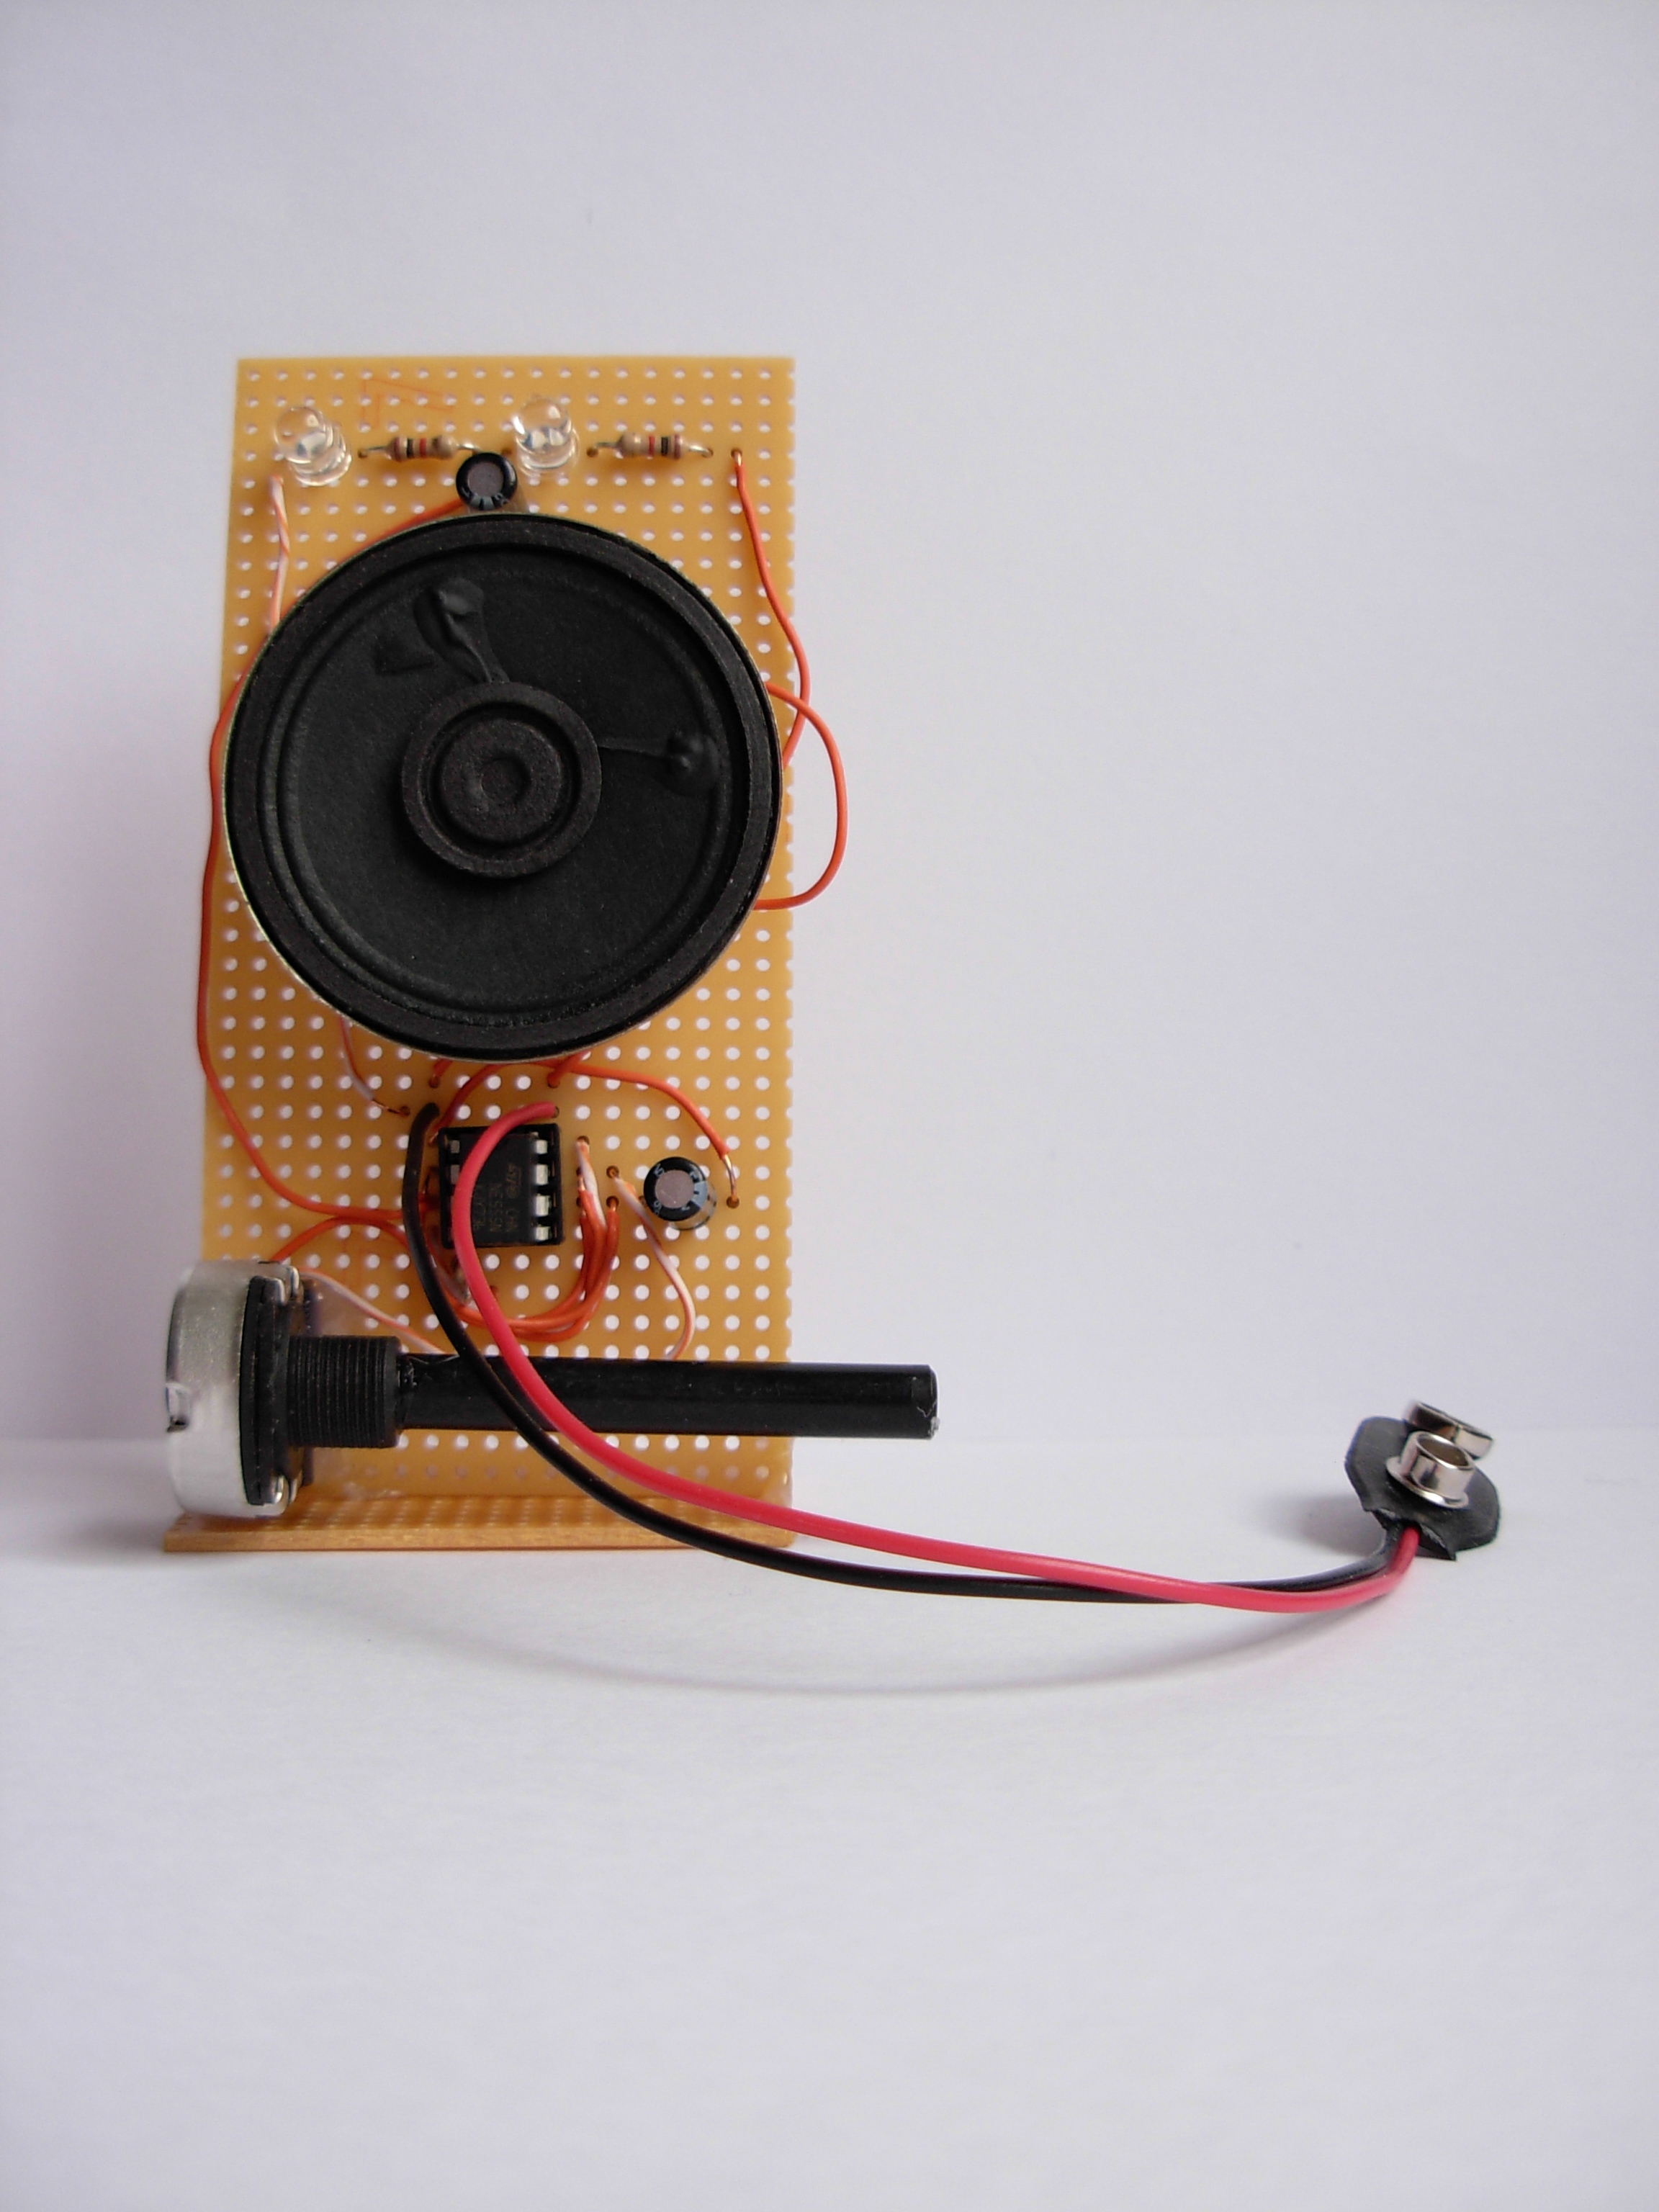 How to Make an Electronic Metronome